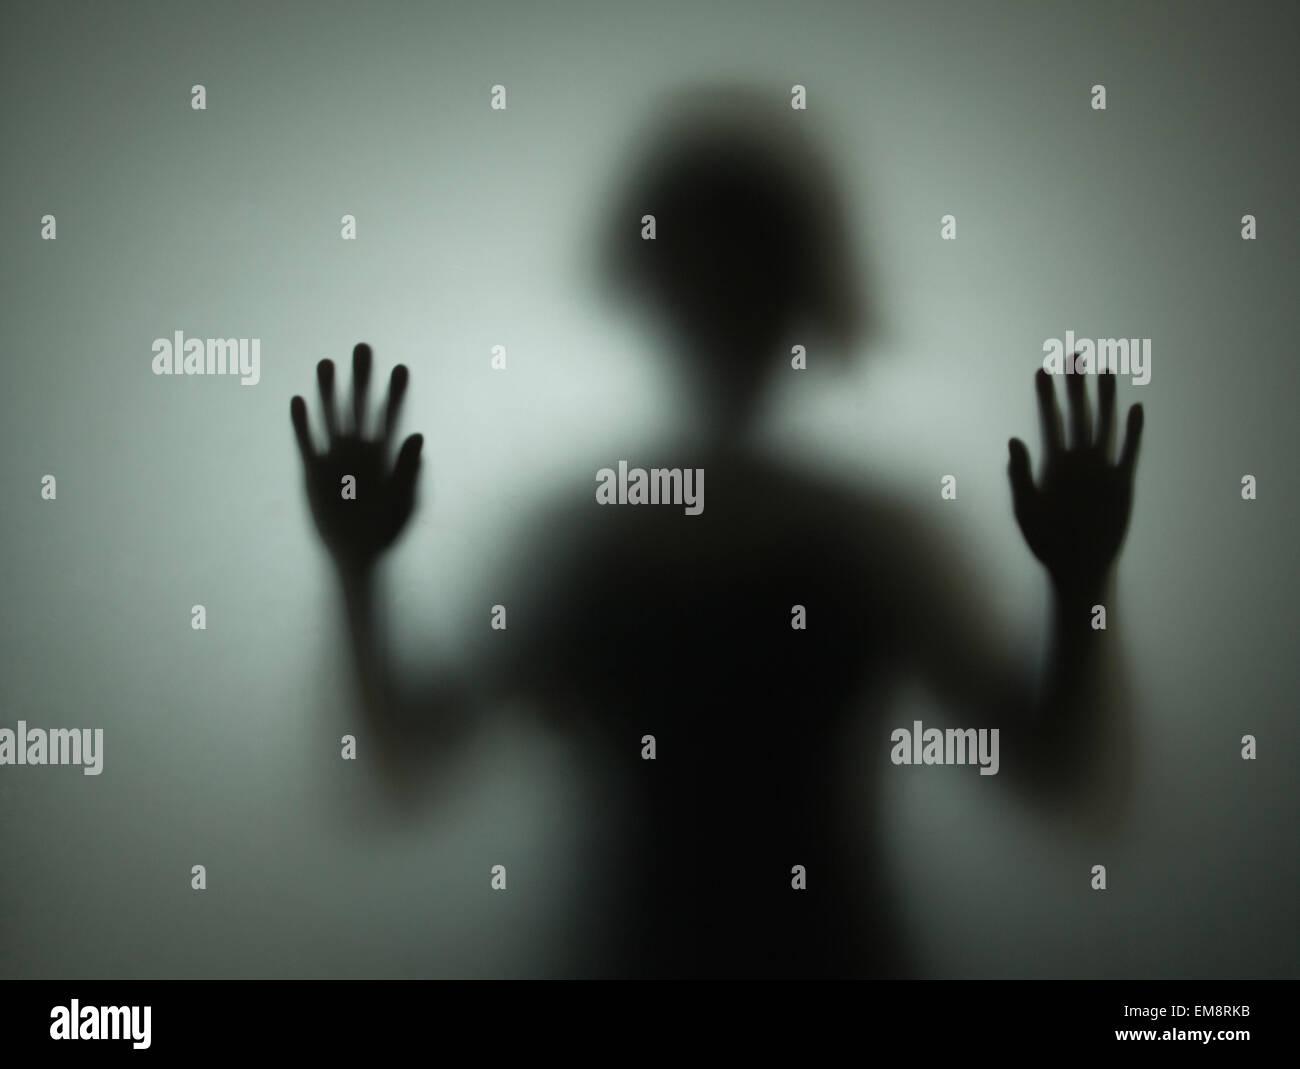 Silhouette der Person hinter Glas Stockfoto, Bild: 81328783 - Alamy